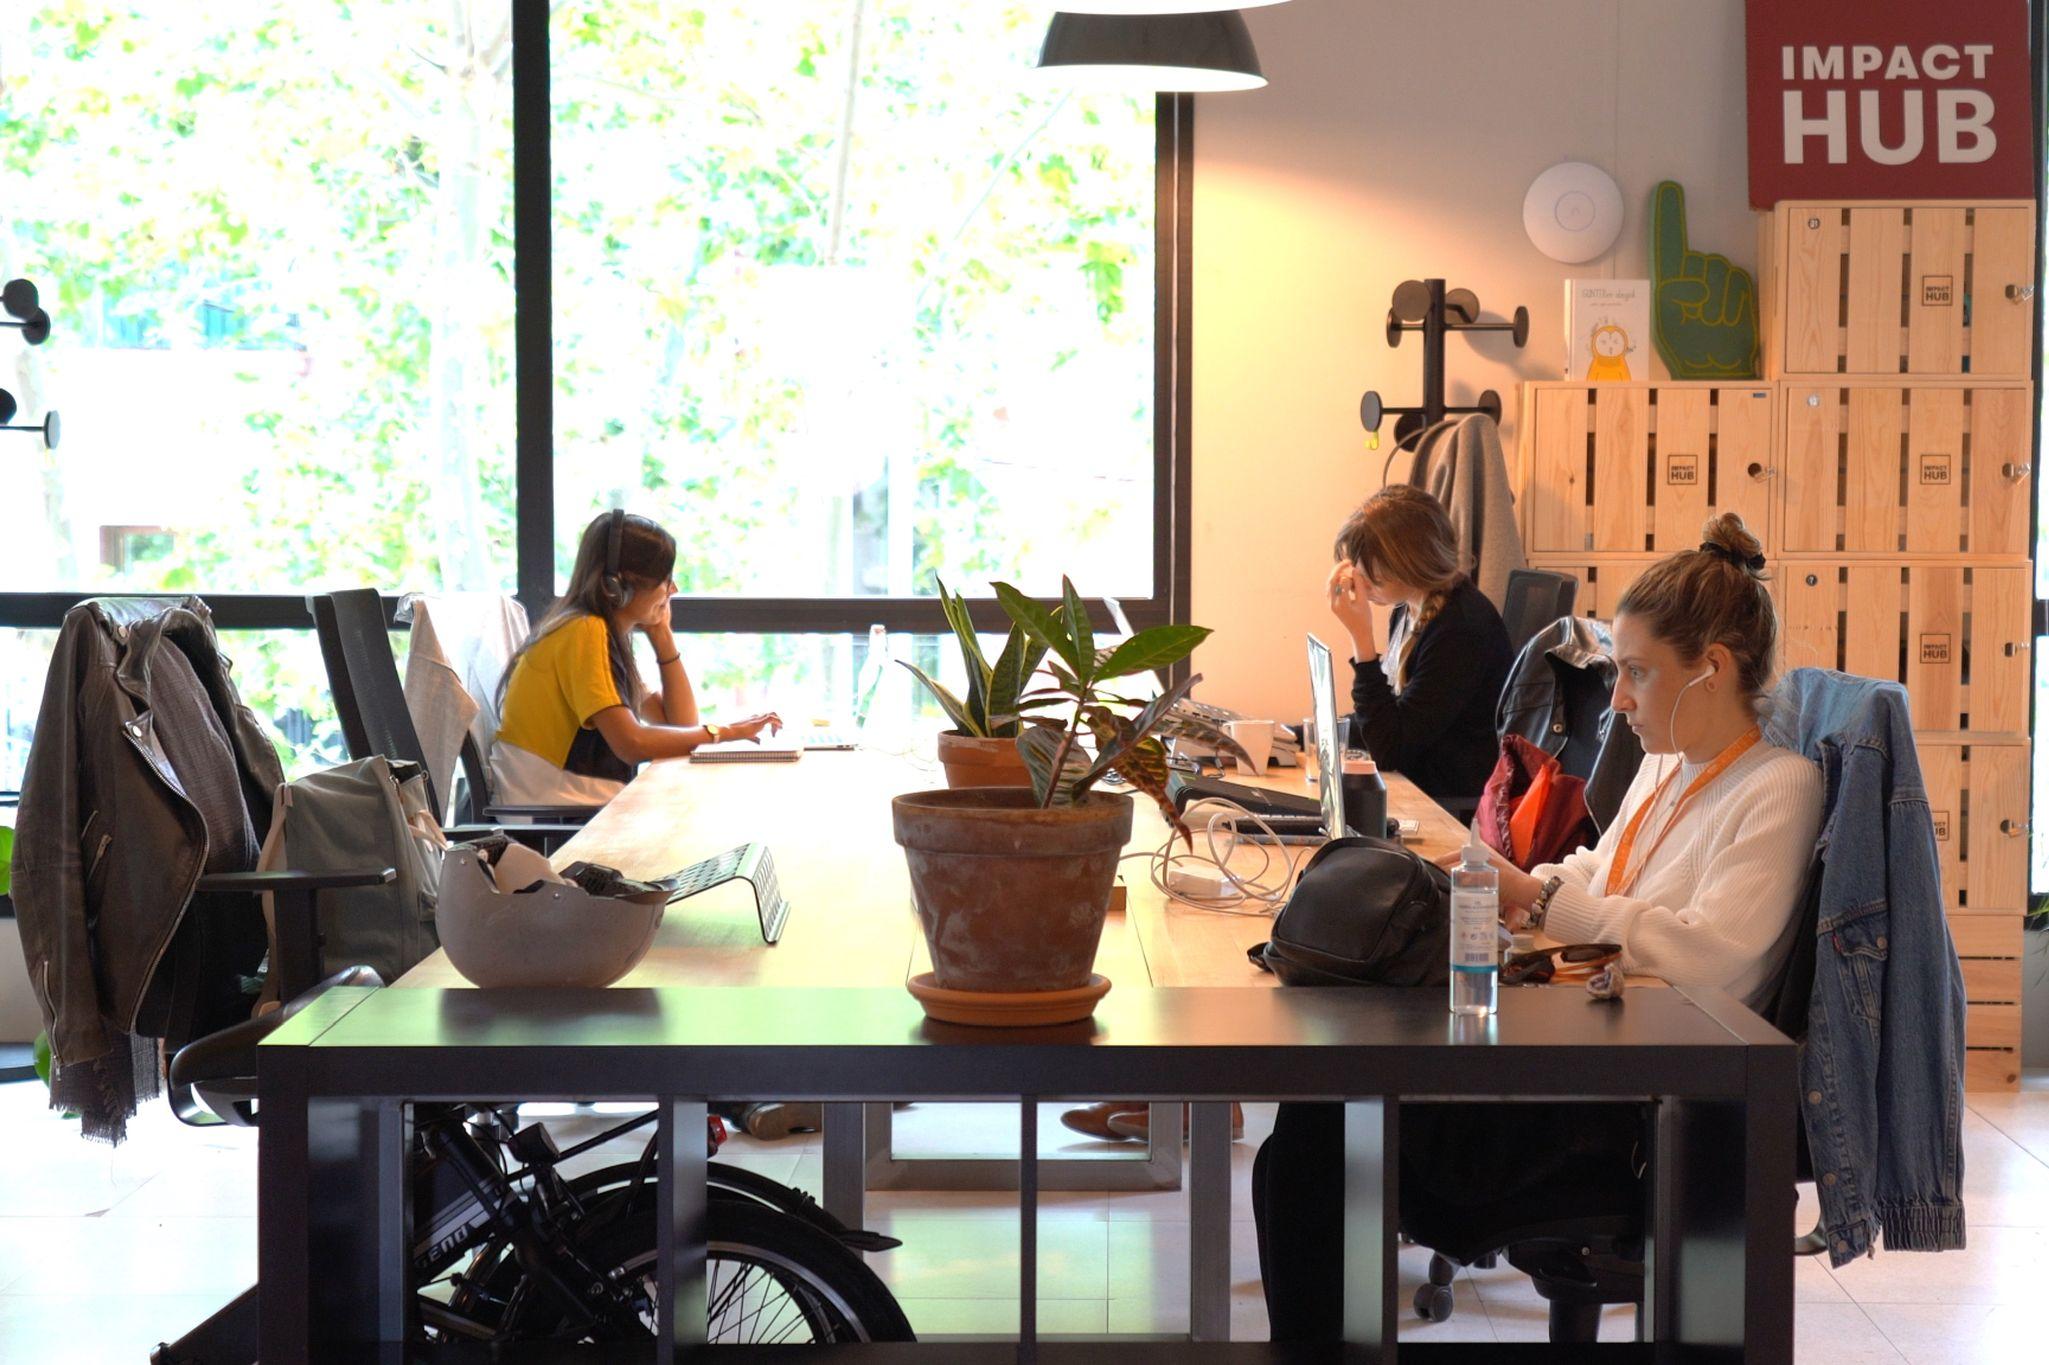 Buscamos responsable de centro Impact Hub Barcelona (puesto temporal)